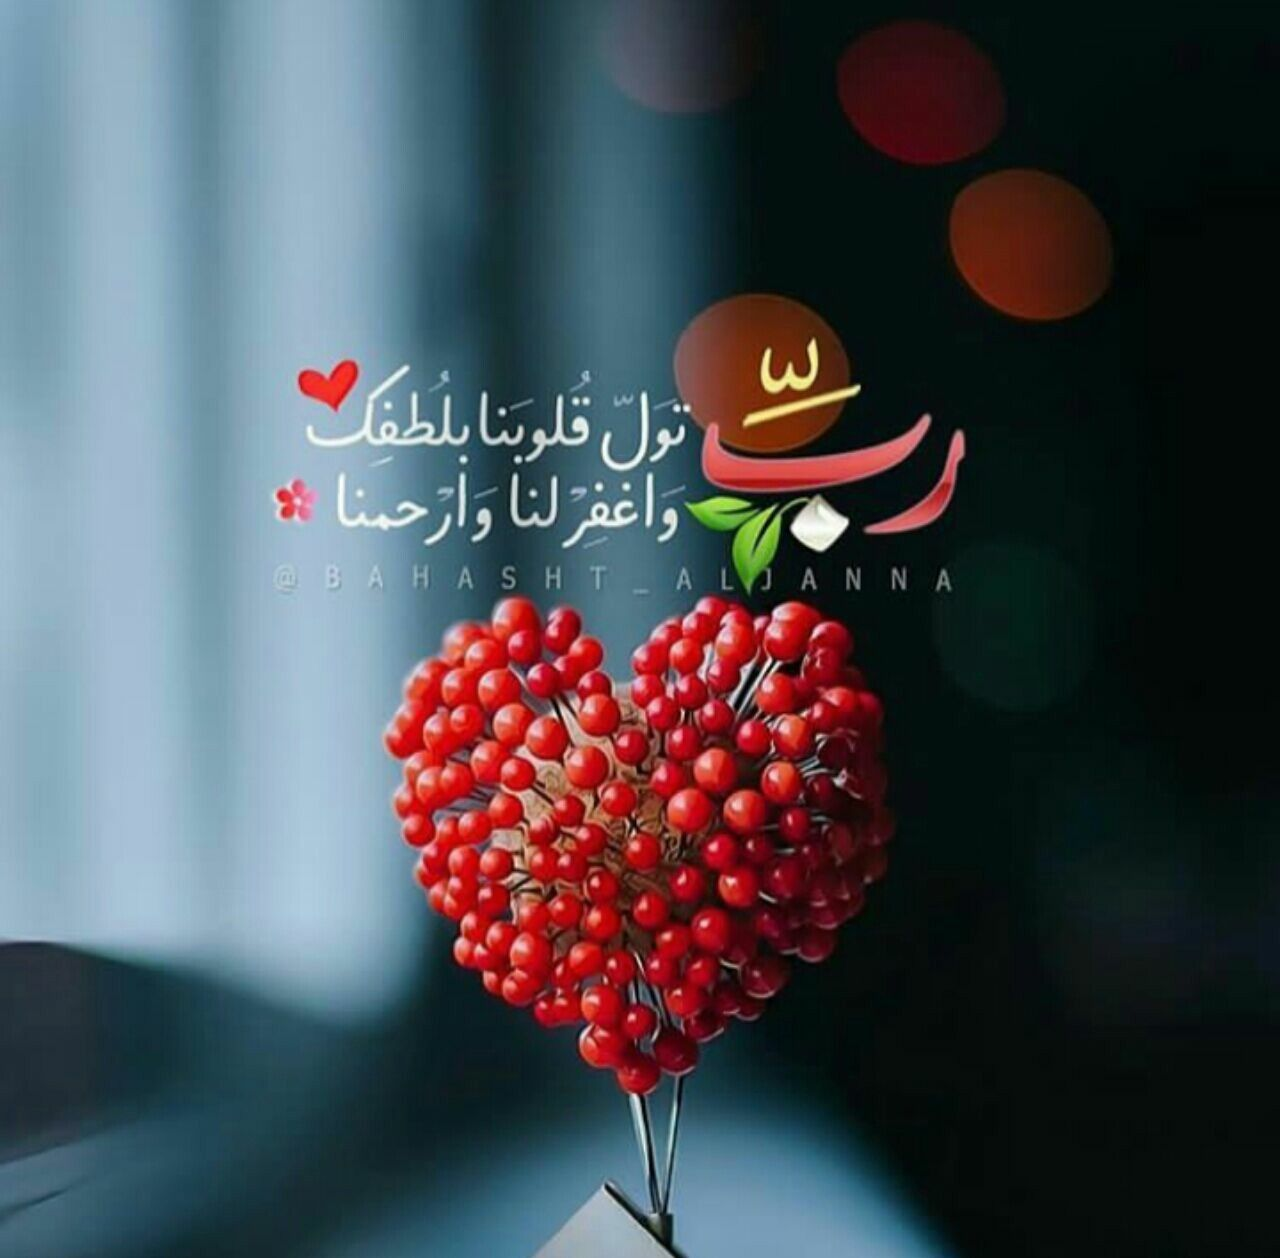 Pin By رحمة عبد الهادي On أجيب دعوة الداعي Islam Ramadan Kareem Red Peppercorn